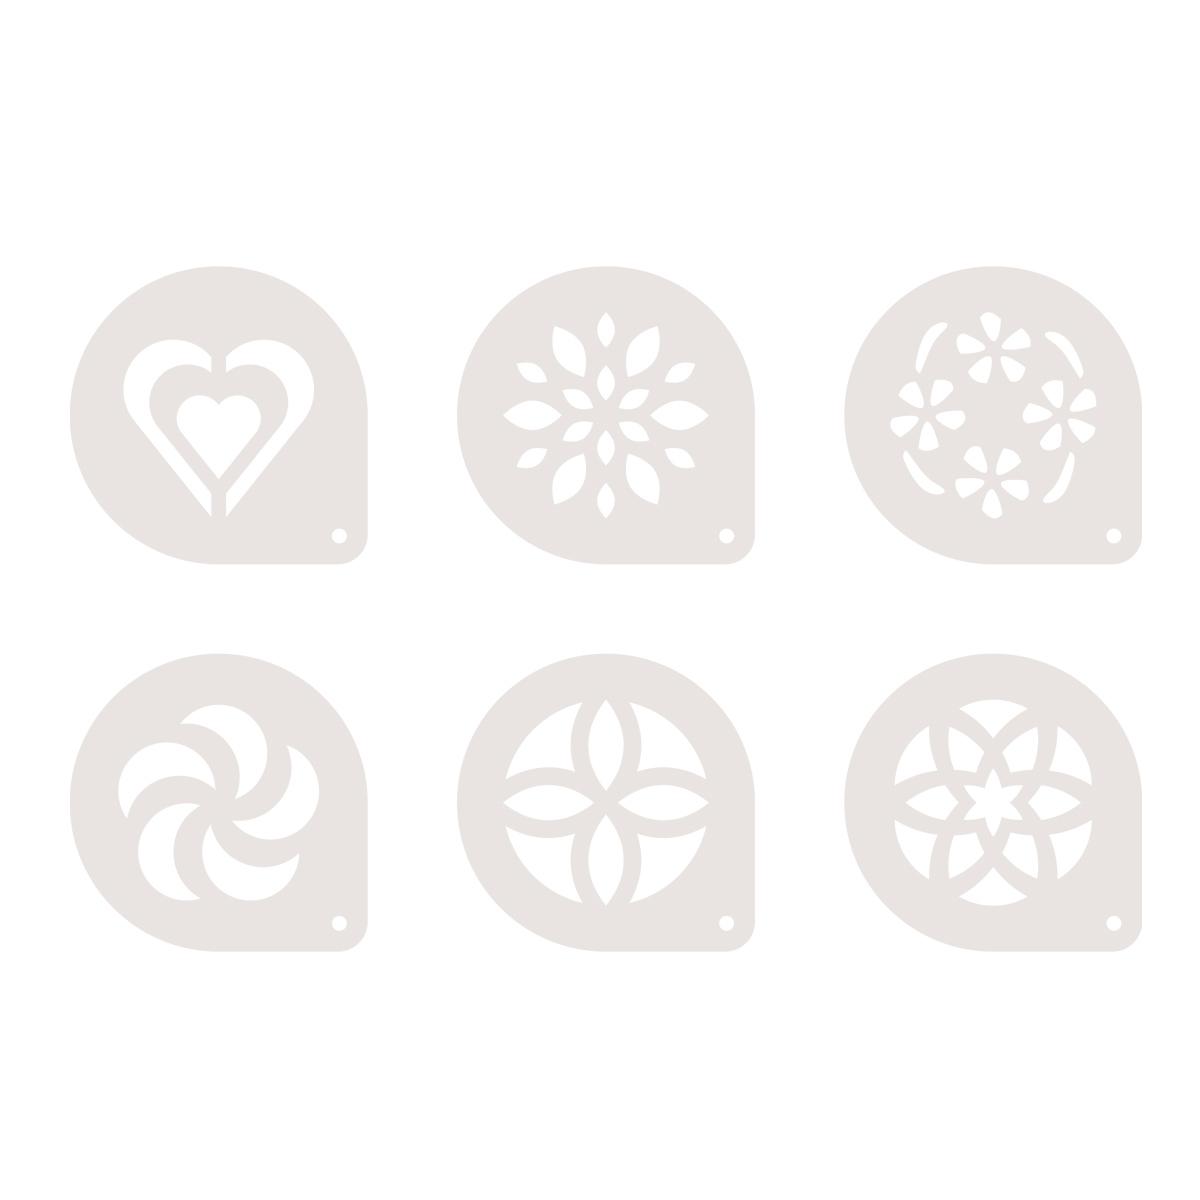 Šablony na cappuccino myDRINK, 6 ks